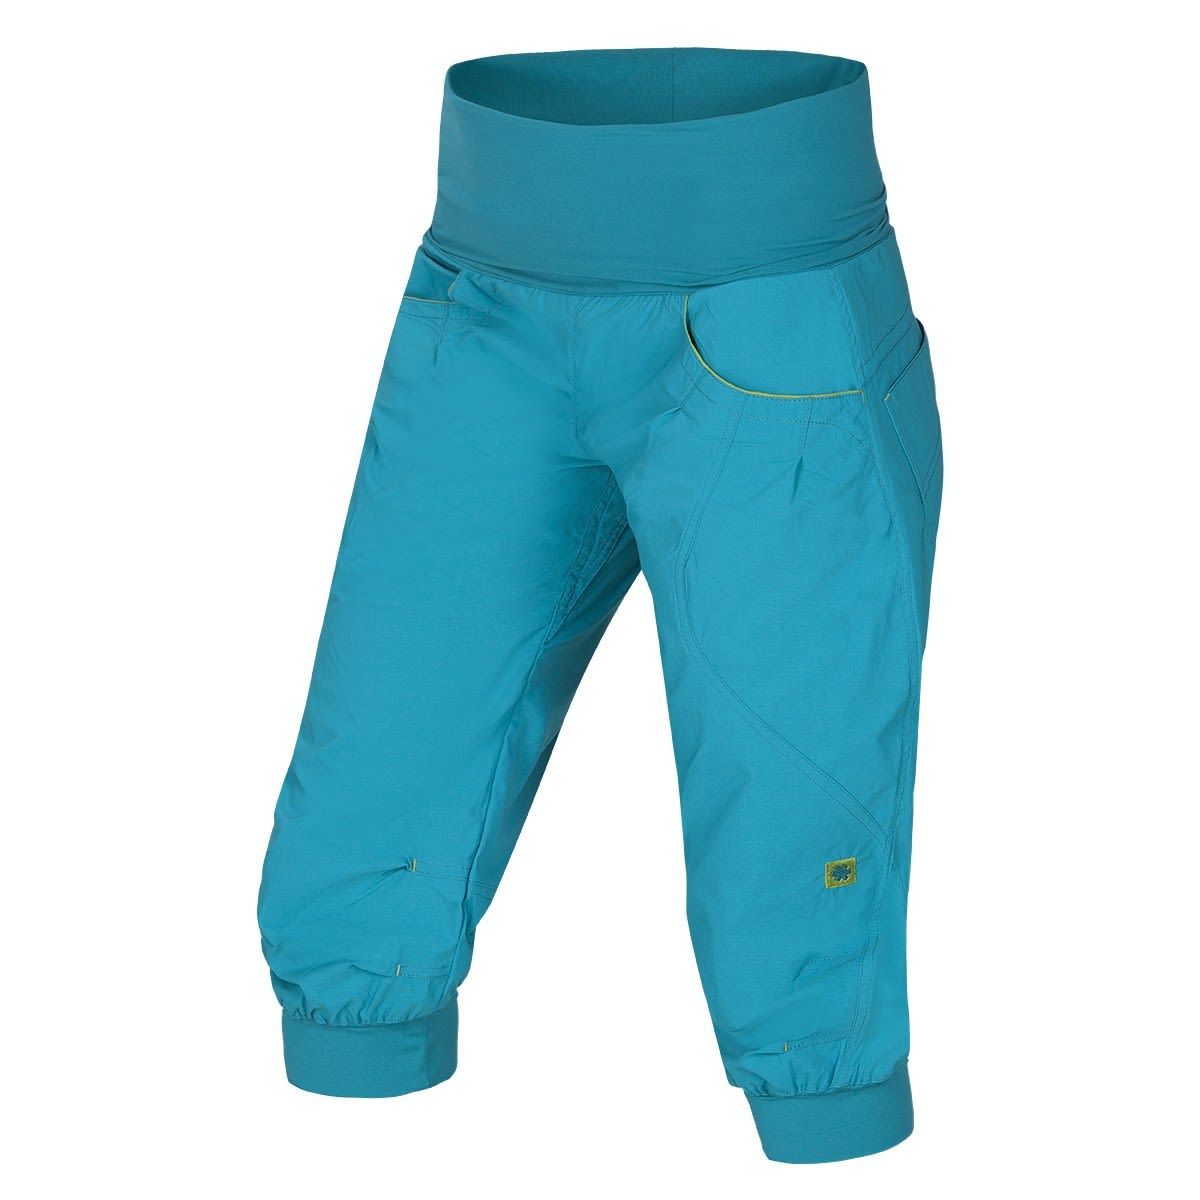 Ocun Noya Shorts Blau, Female Shorts, XXS